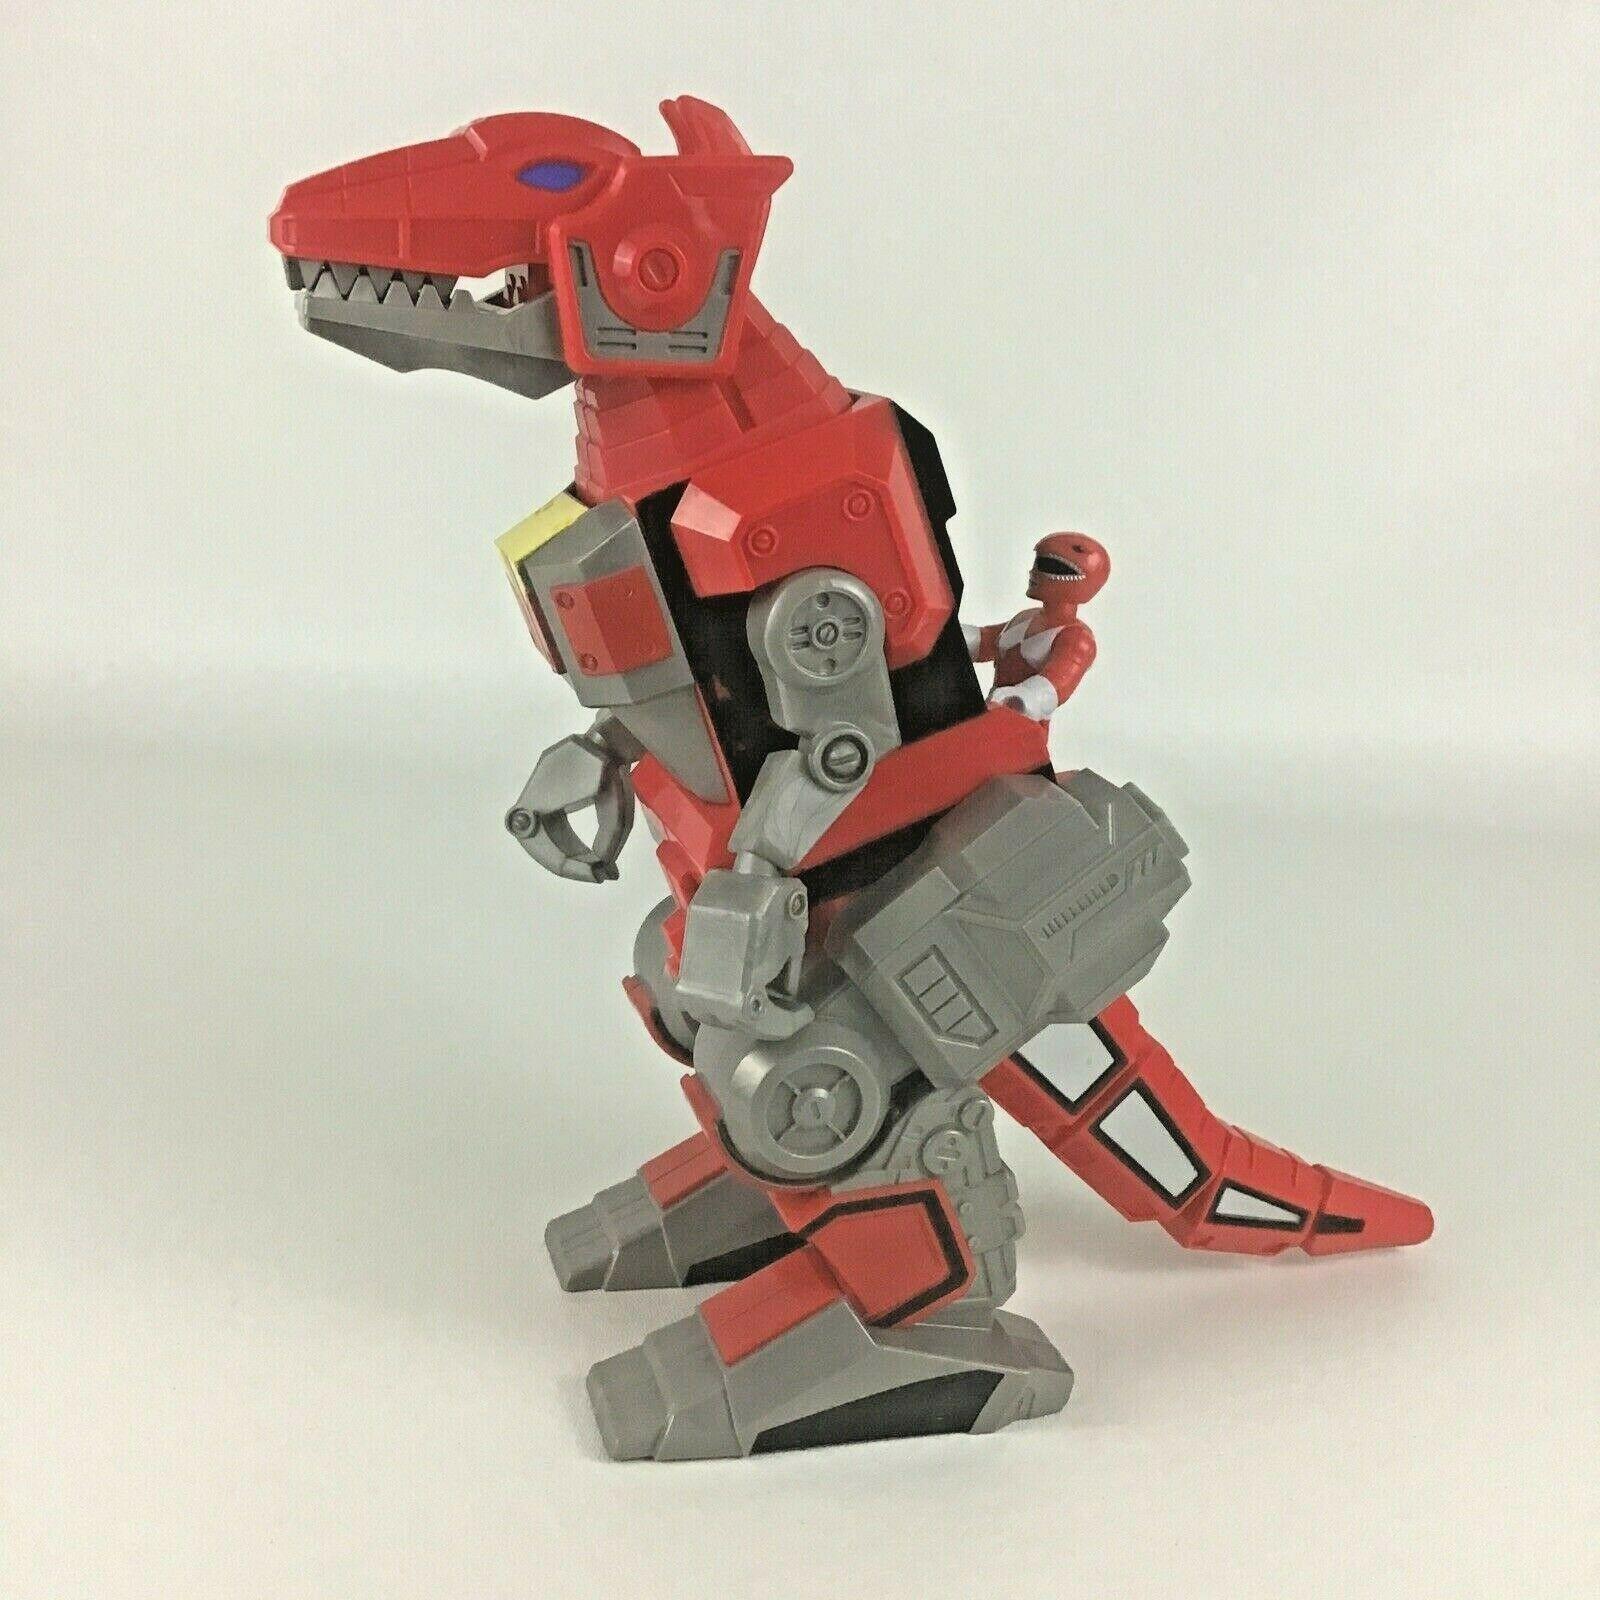 Imaginext Power Rangers T-Rex Zord Action Figure Red Ranger Dinozord 2015 Mattel - $89.05